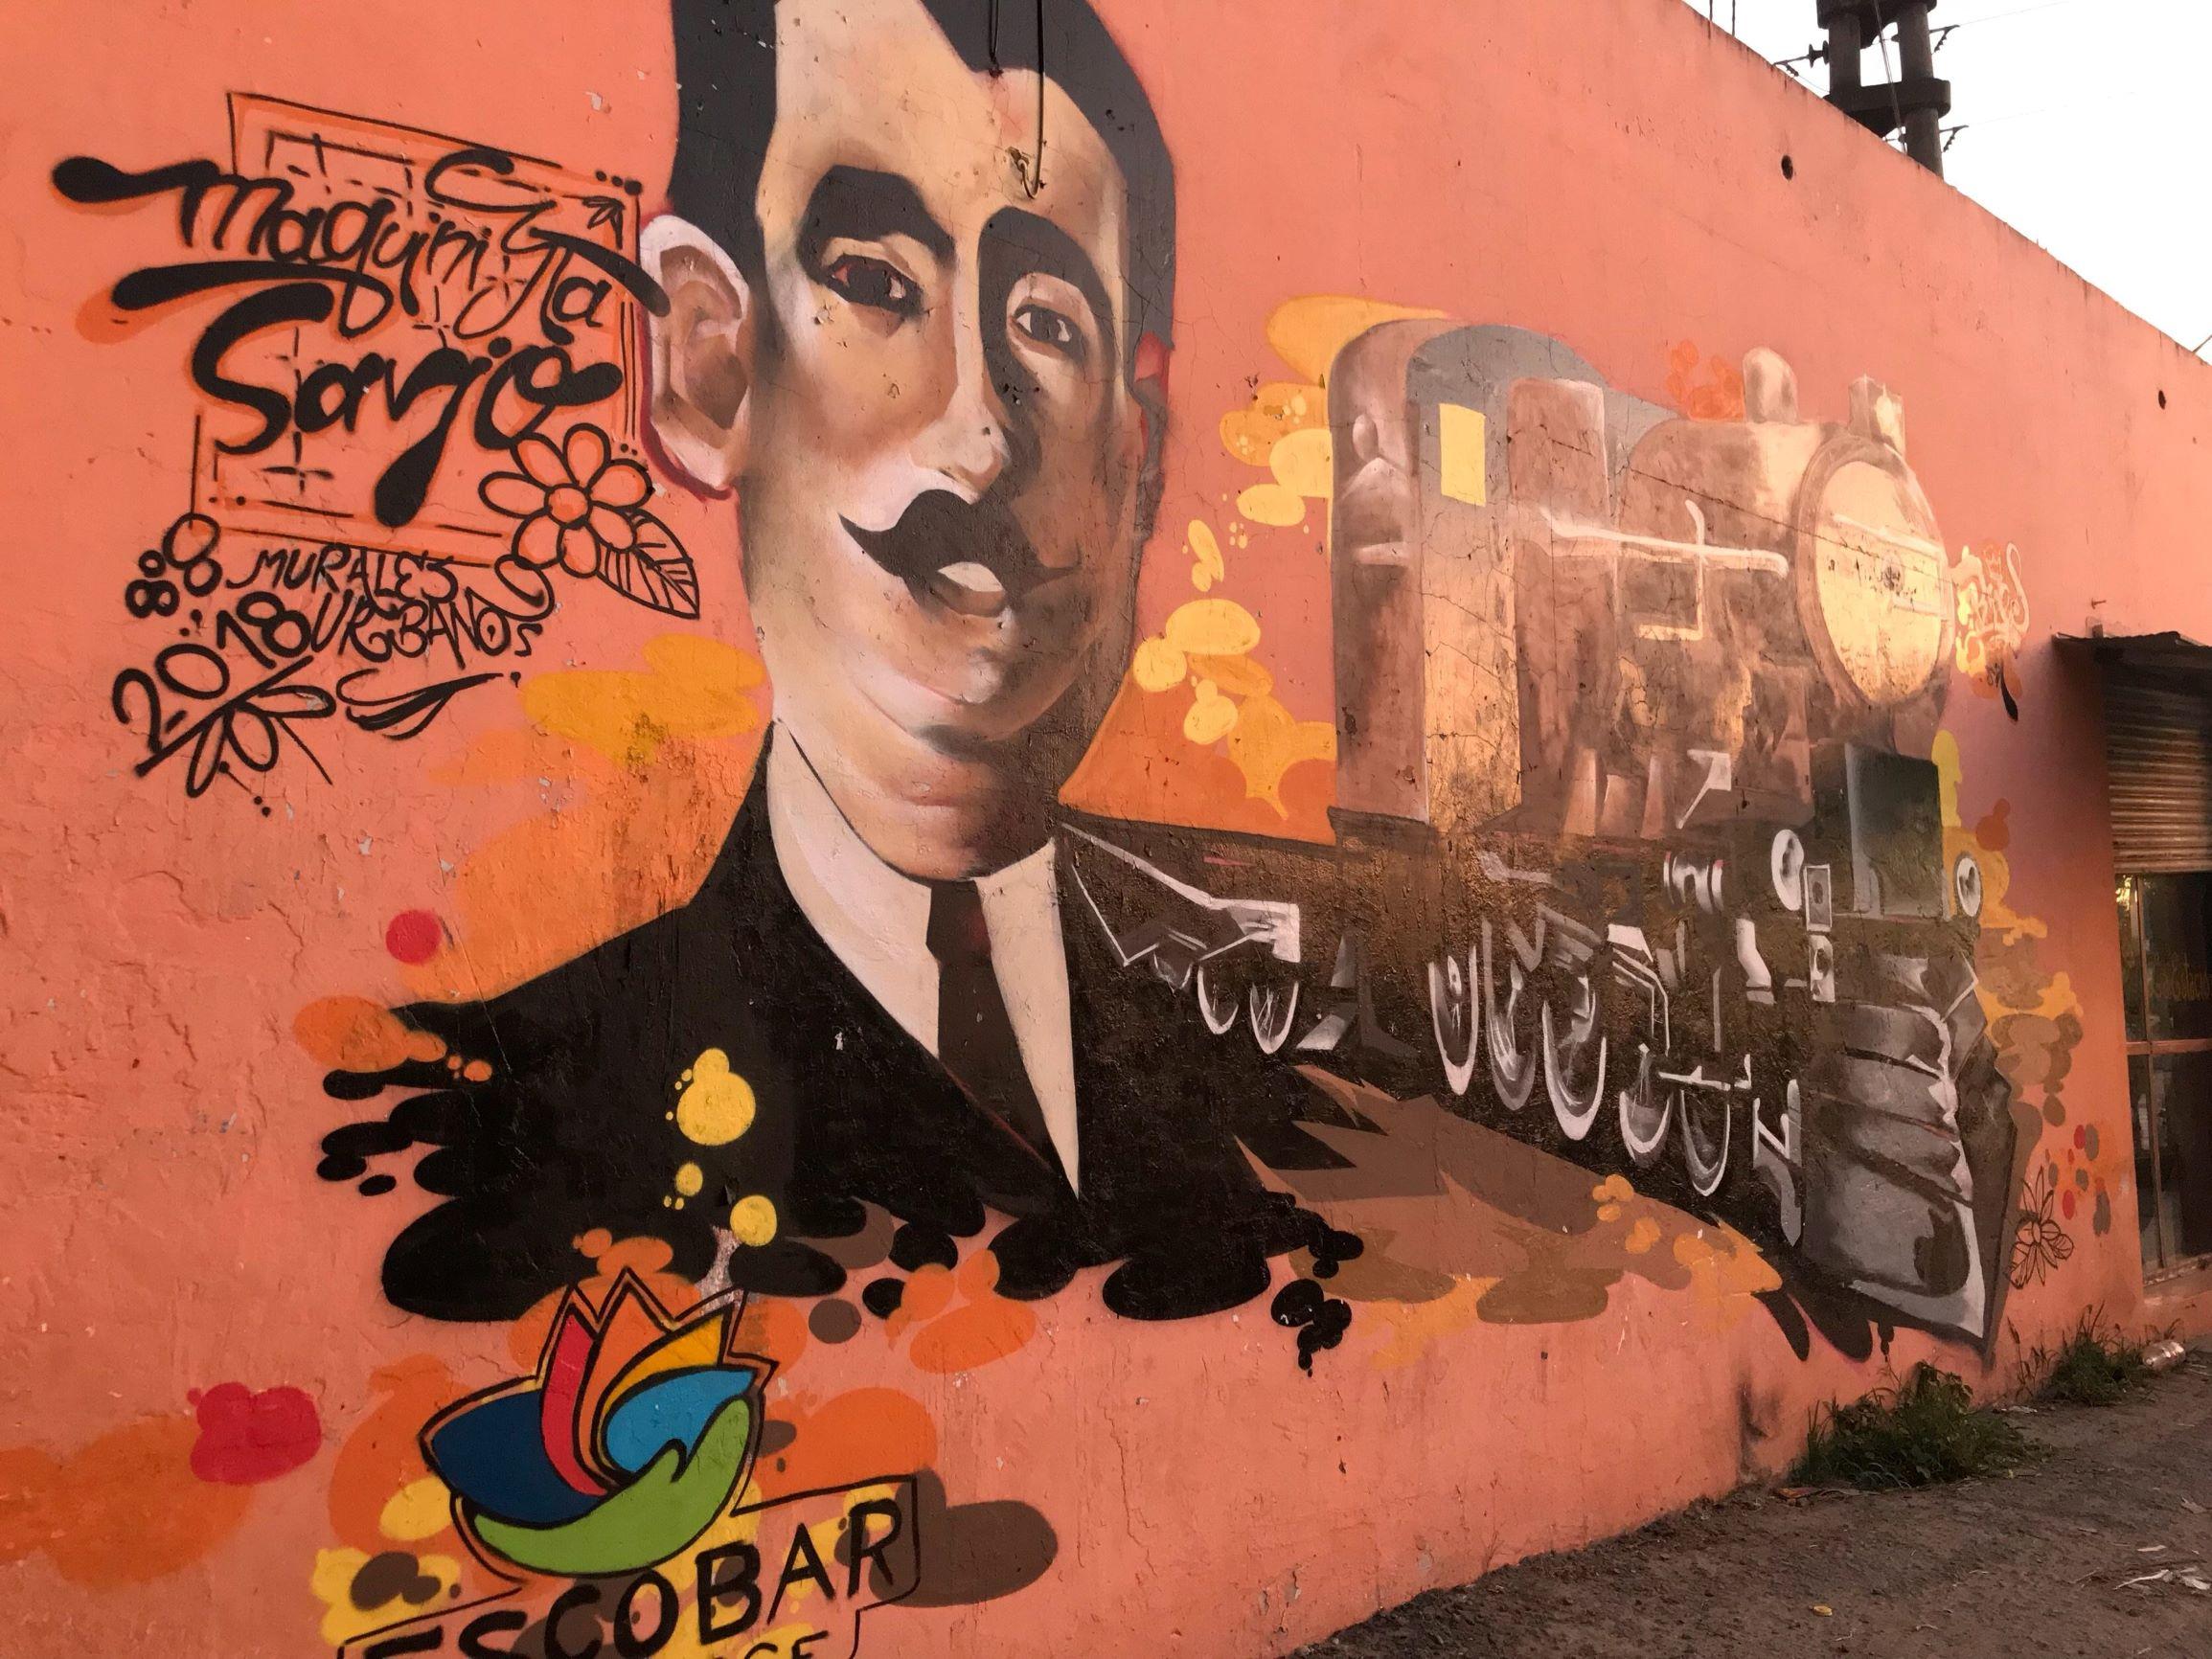 Maquinista Savio mural